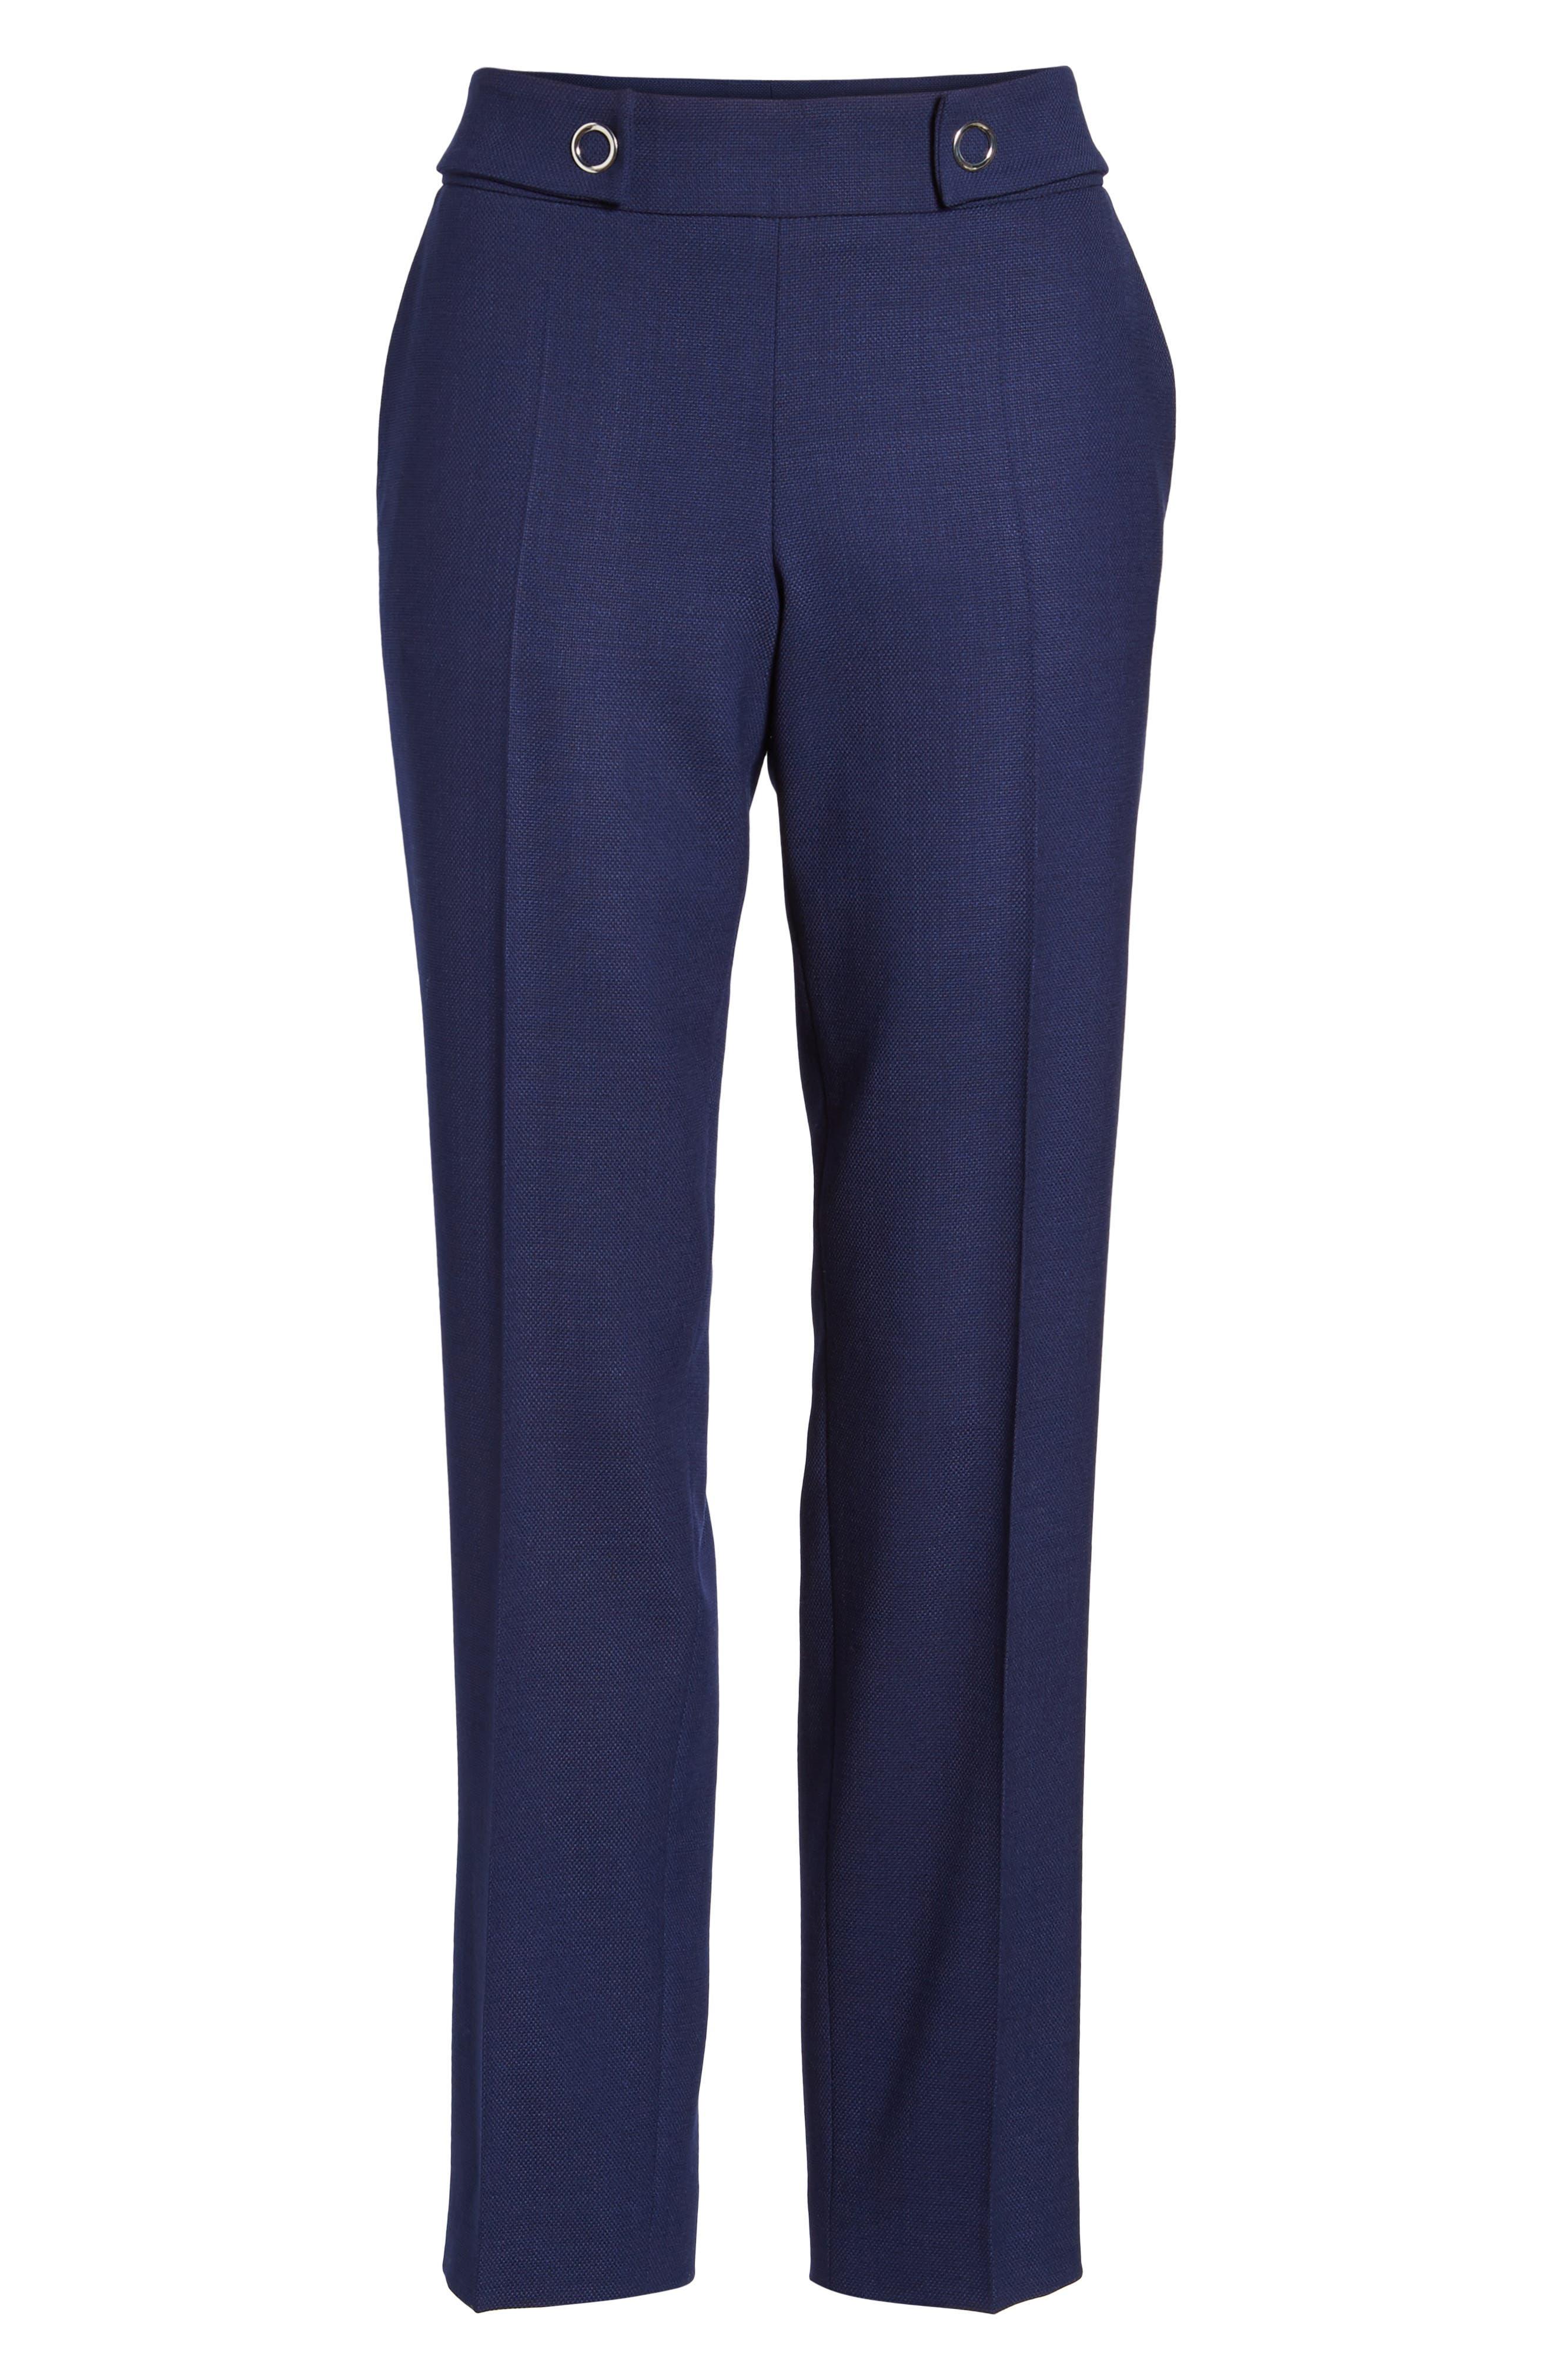 Tibalena Textured Stretch Wool Suit Pants,                             Alternate thumbnail 7, color,                             425